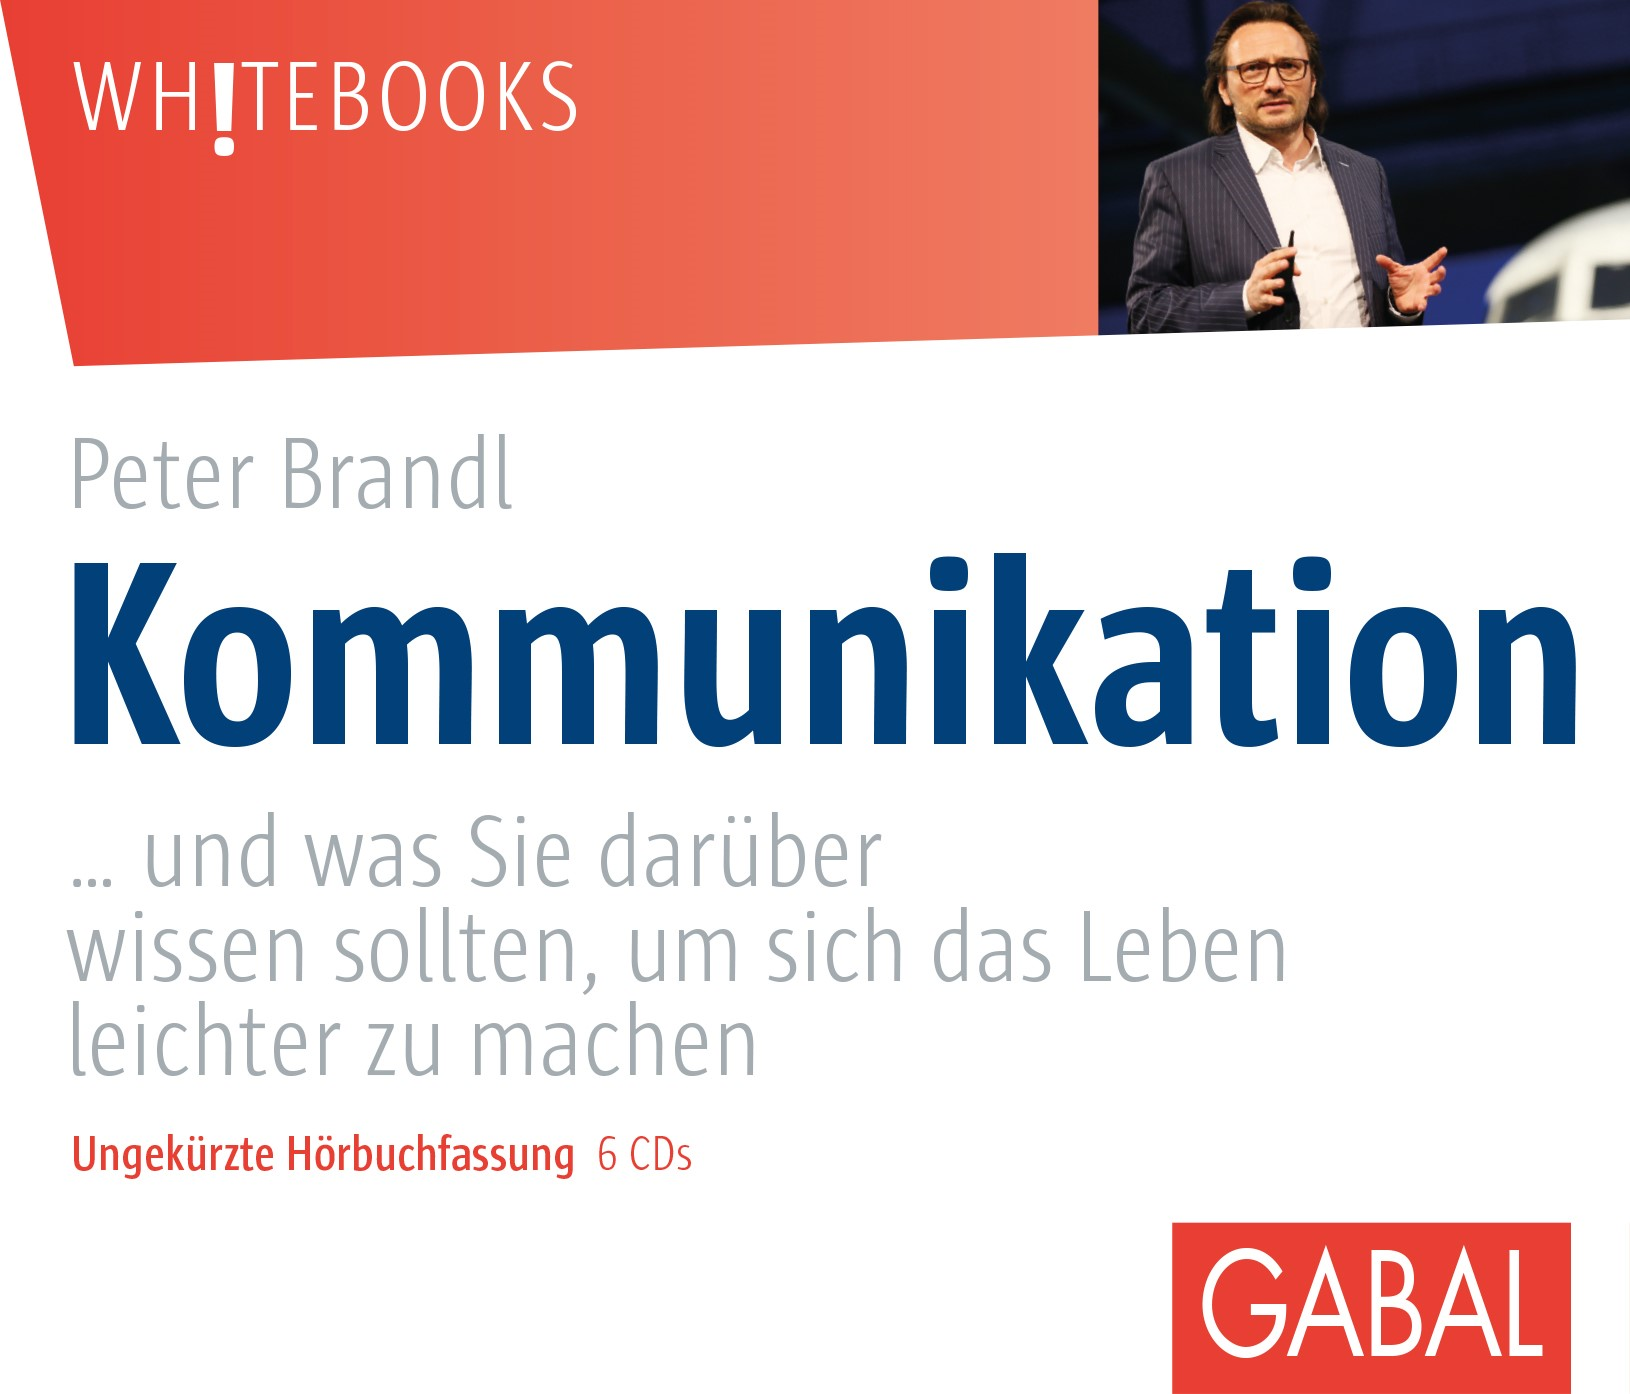 Kommunikation | Brandl, 2016 (Cover)